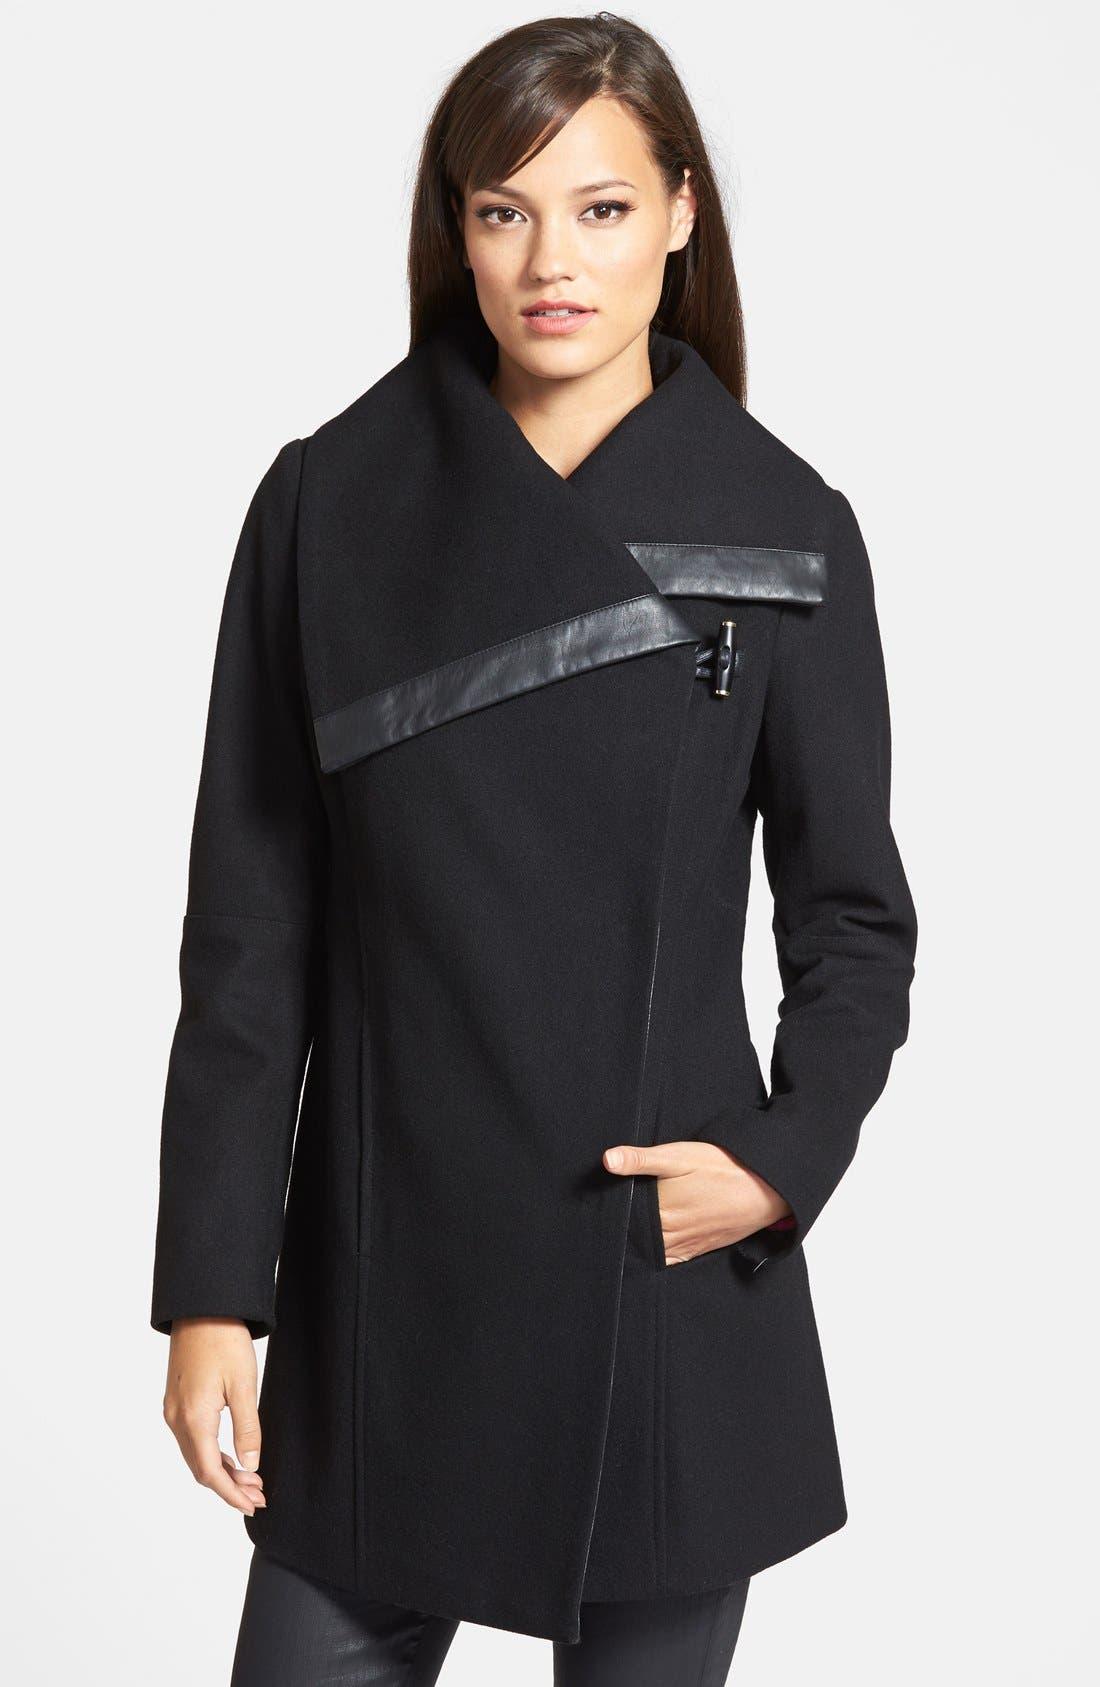 SAM EDELMAN 'Fallon' Faux Leather Trim Asymmetrical Wool Blend Coat, Main, color, 001